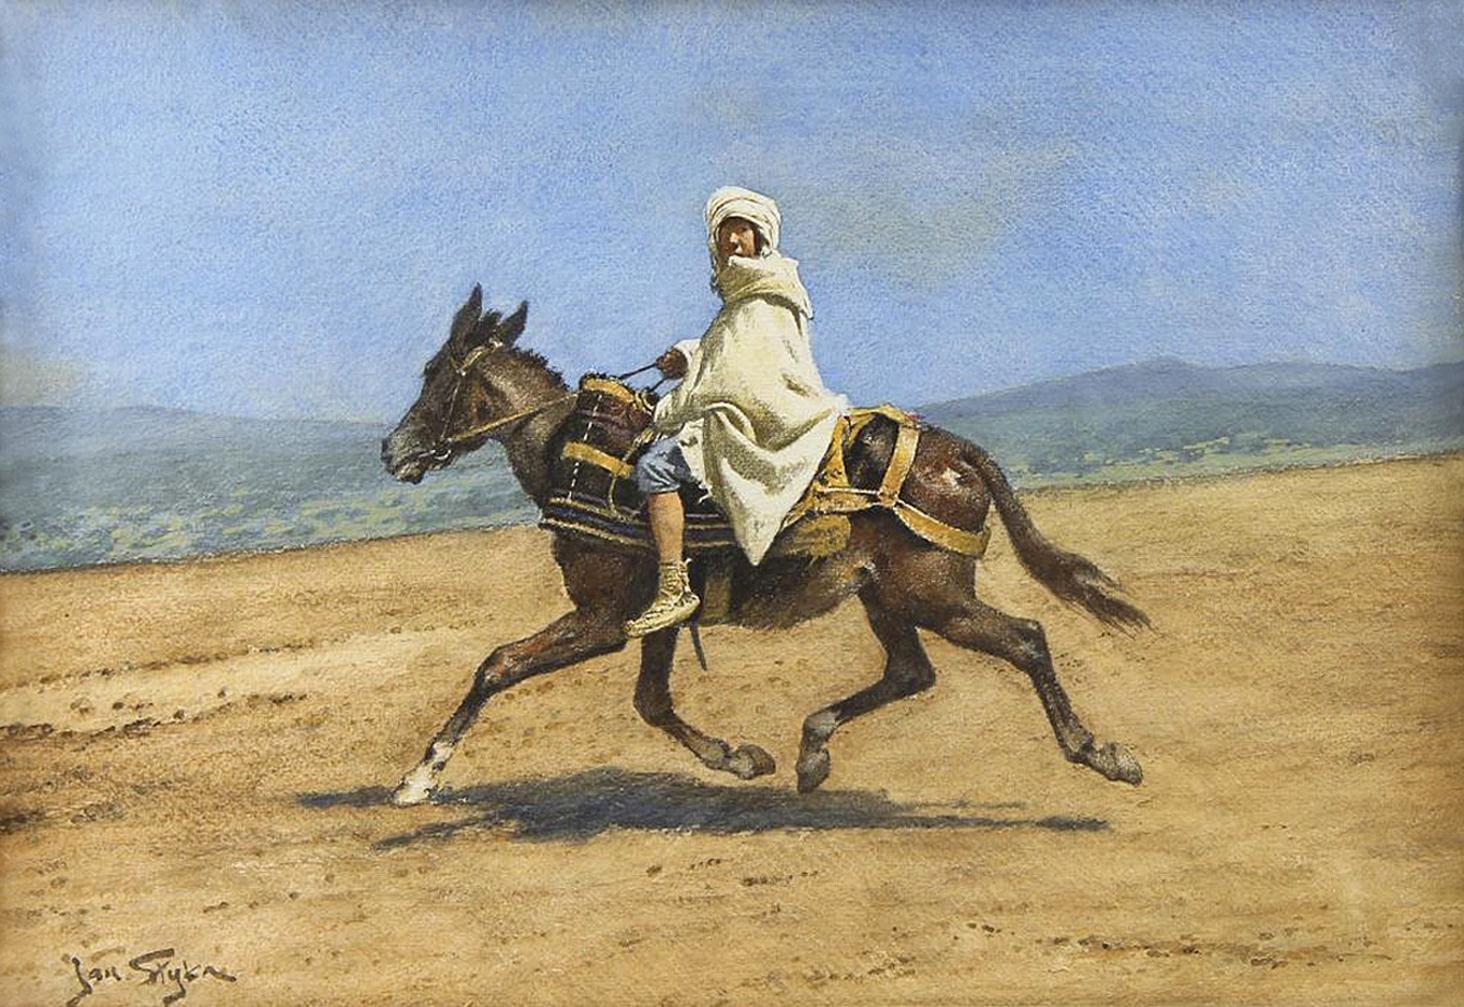 Ян Стика. Палестина вершник, 1920; папір, акварель, 32х46 см